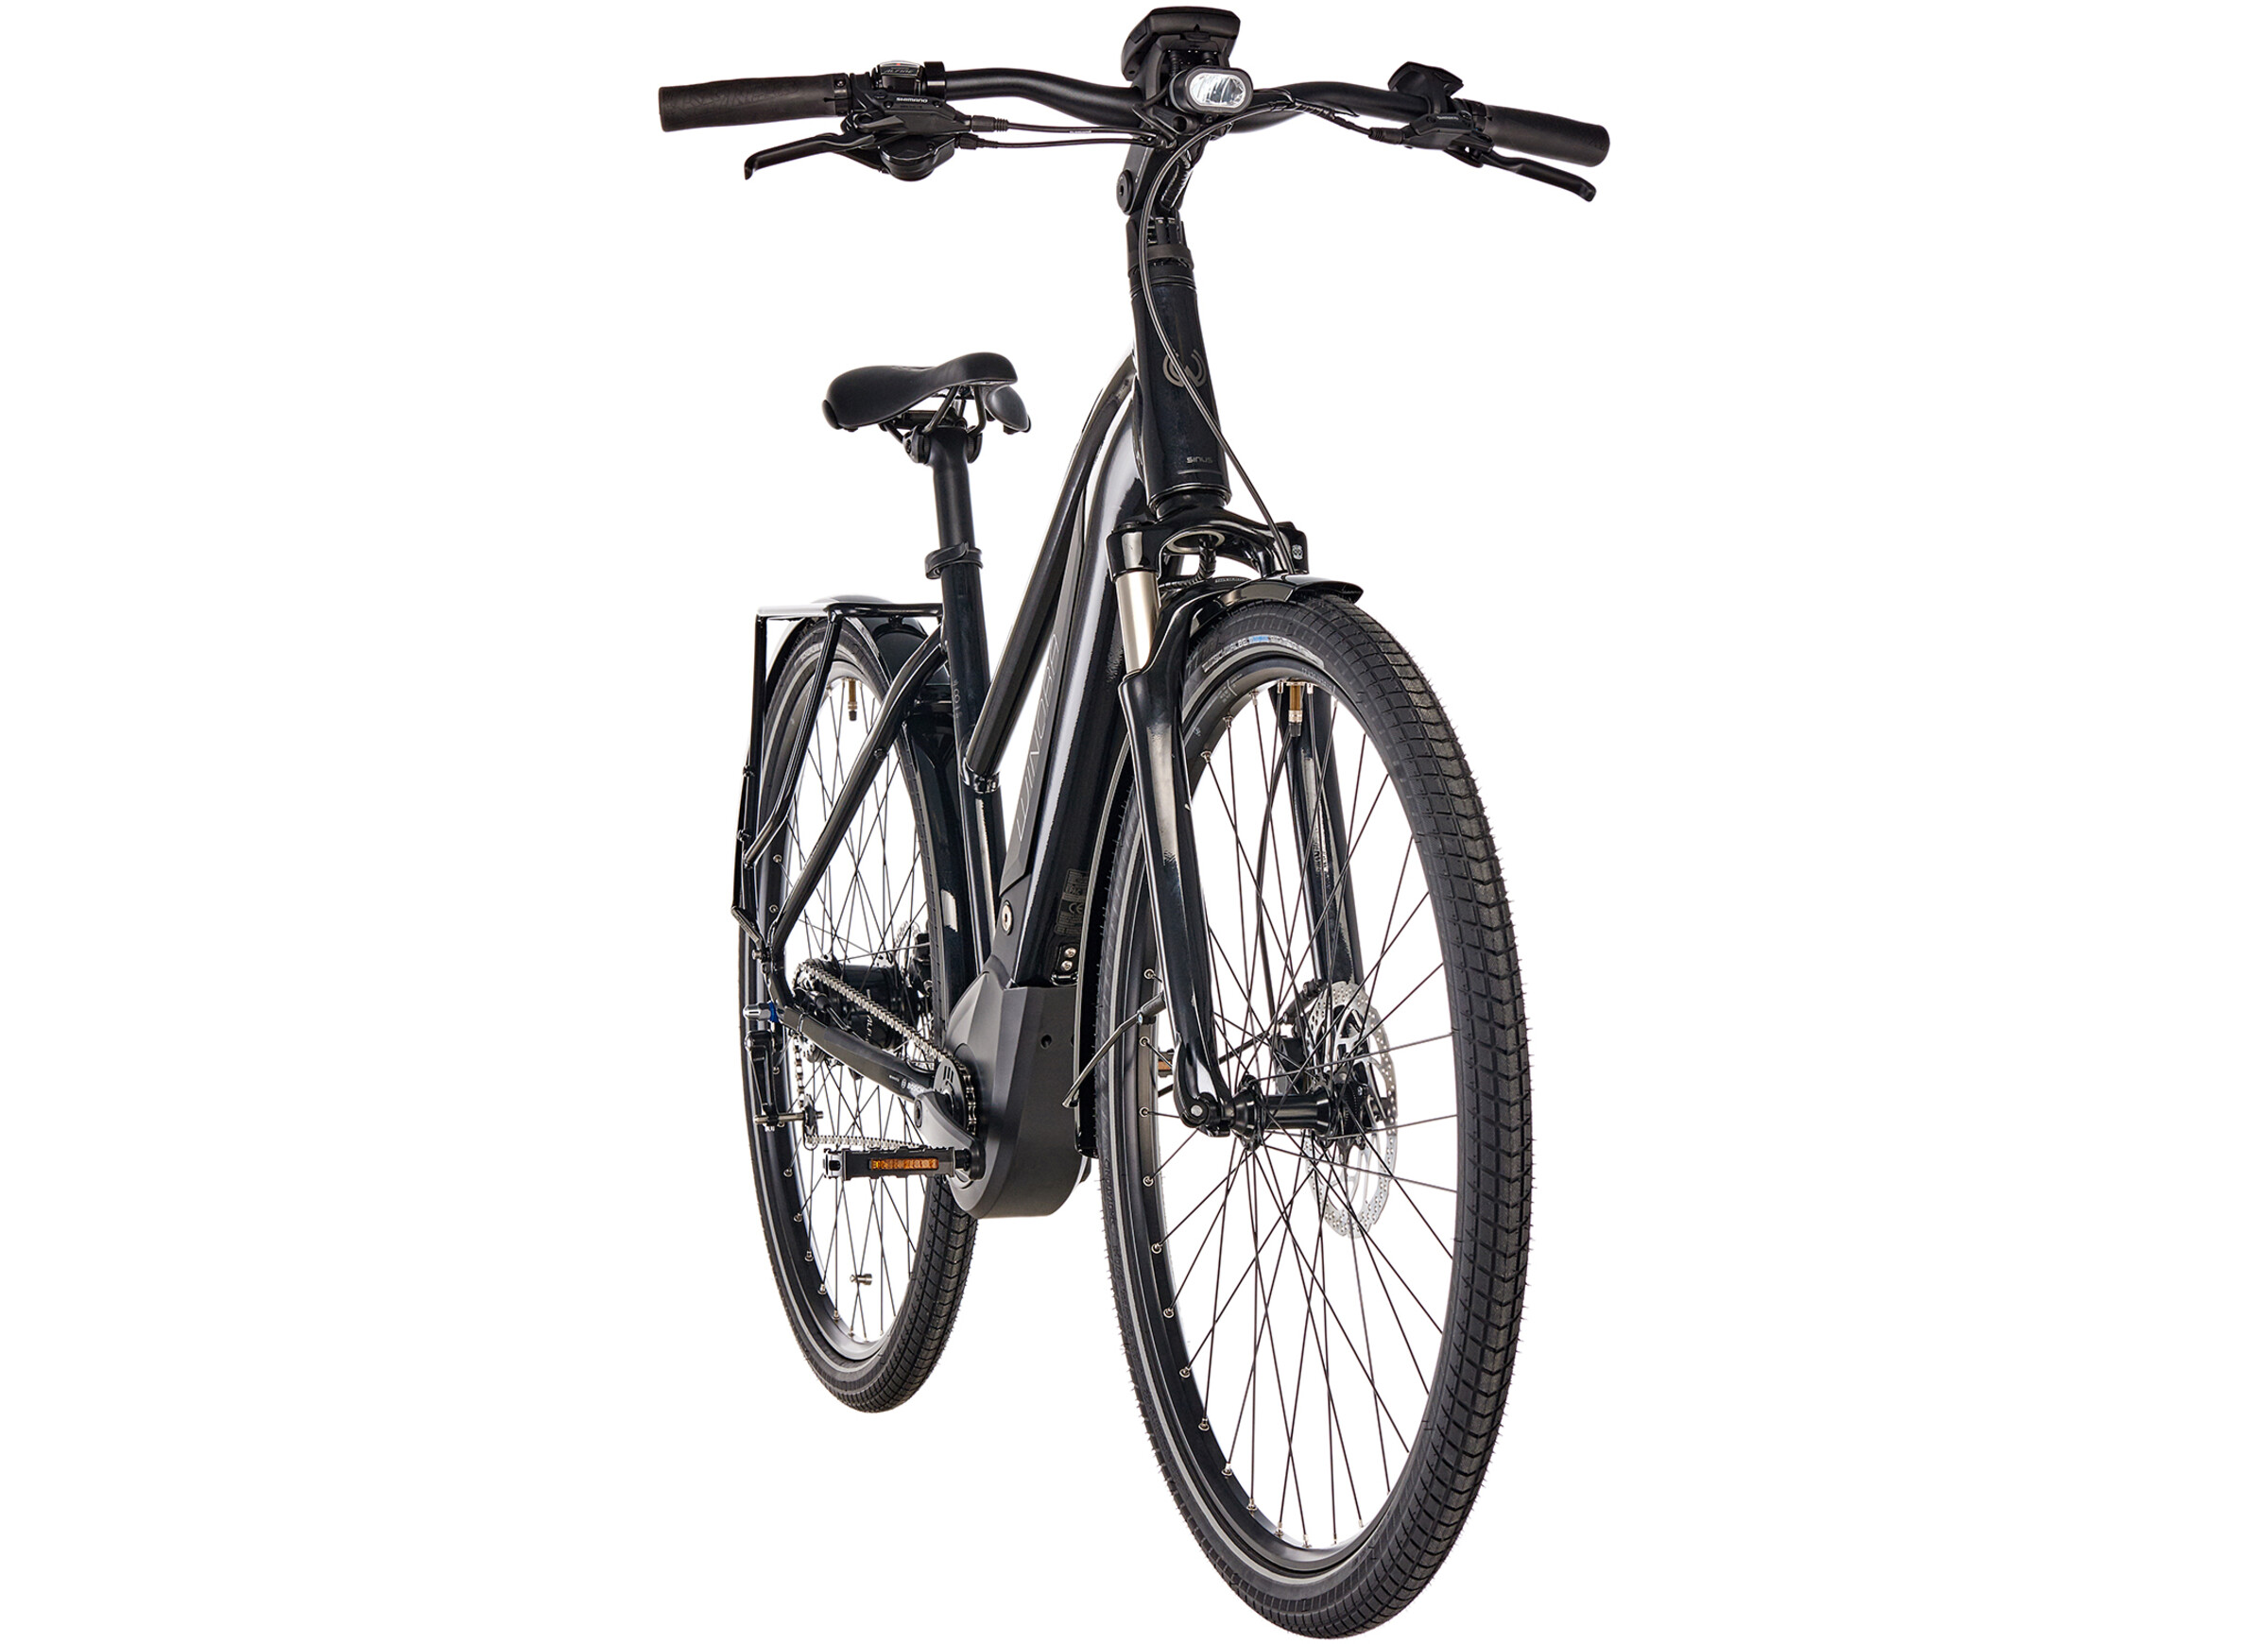 8d945a9d4d0 Winora Sinus iN8 Urban E-City Bike Women black at Bikester.co.uk